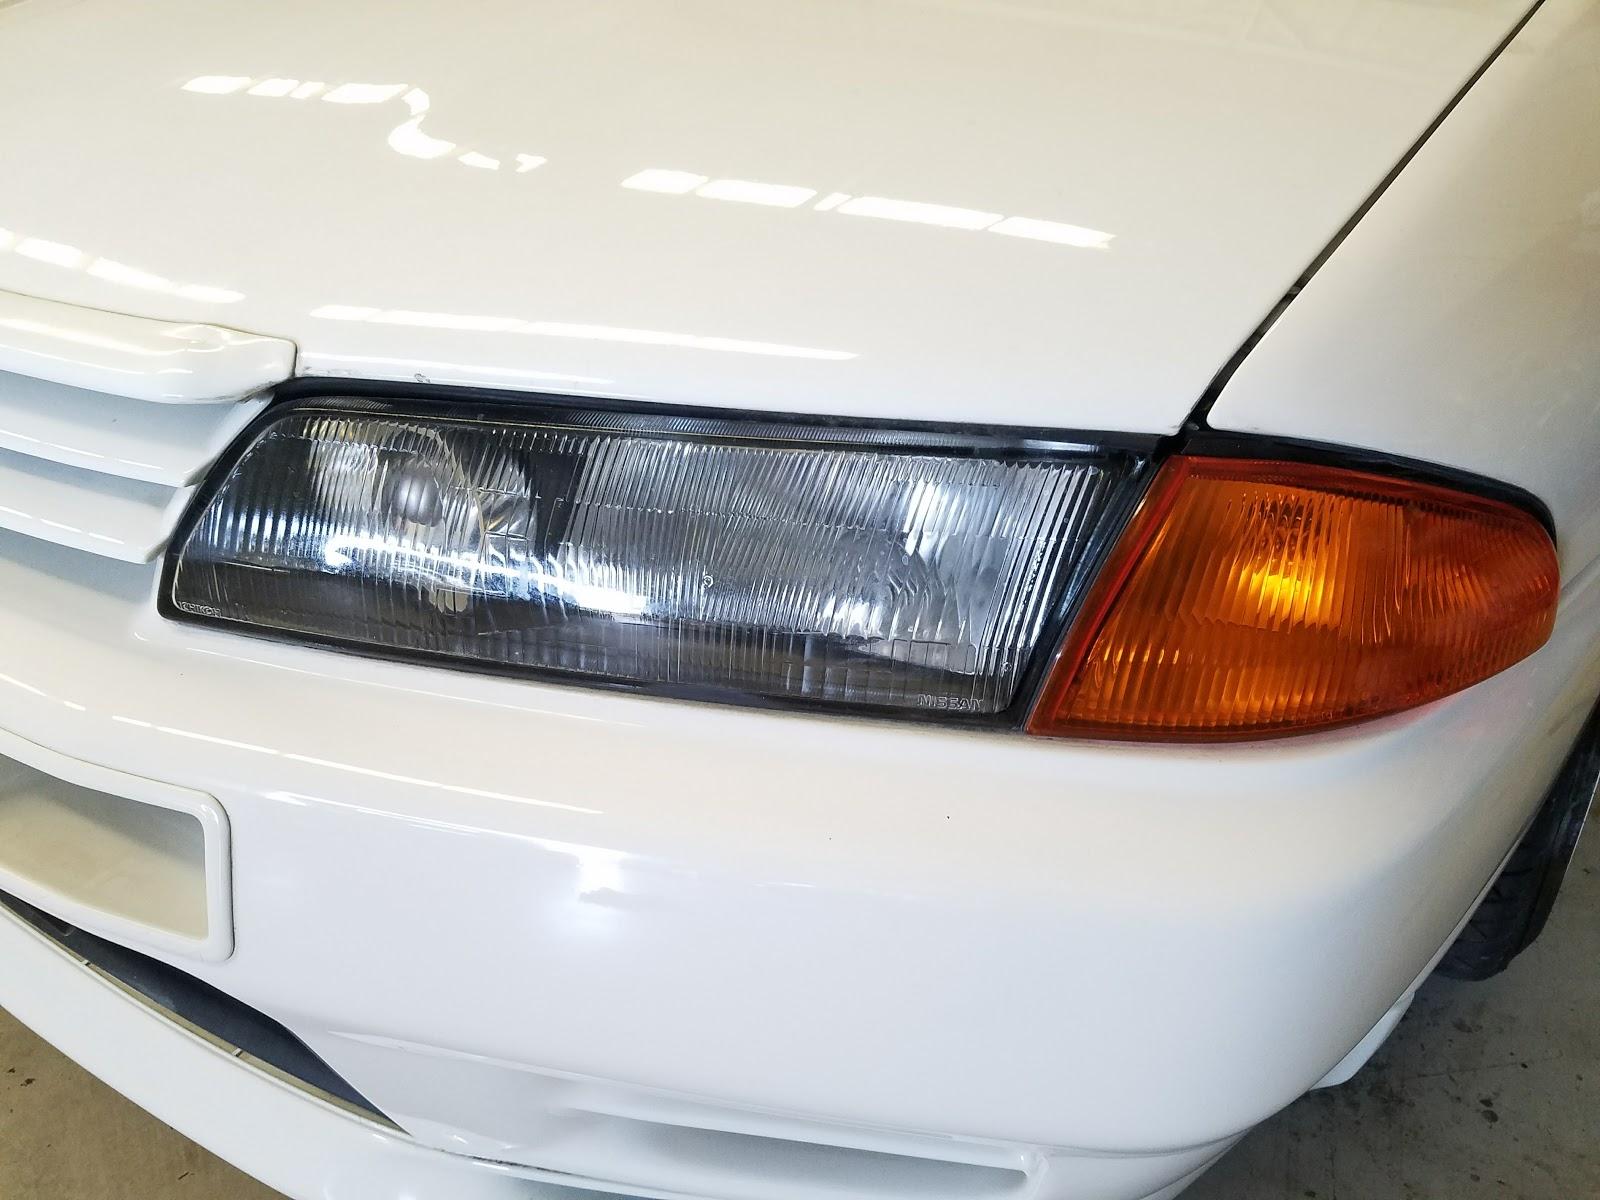 Oem 0912 Nissan Gtr Headlight High Beam Bulb Wiring Harness Wire